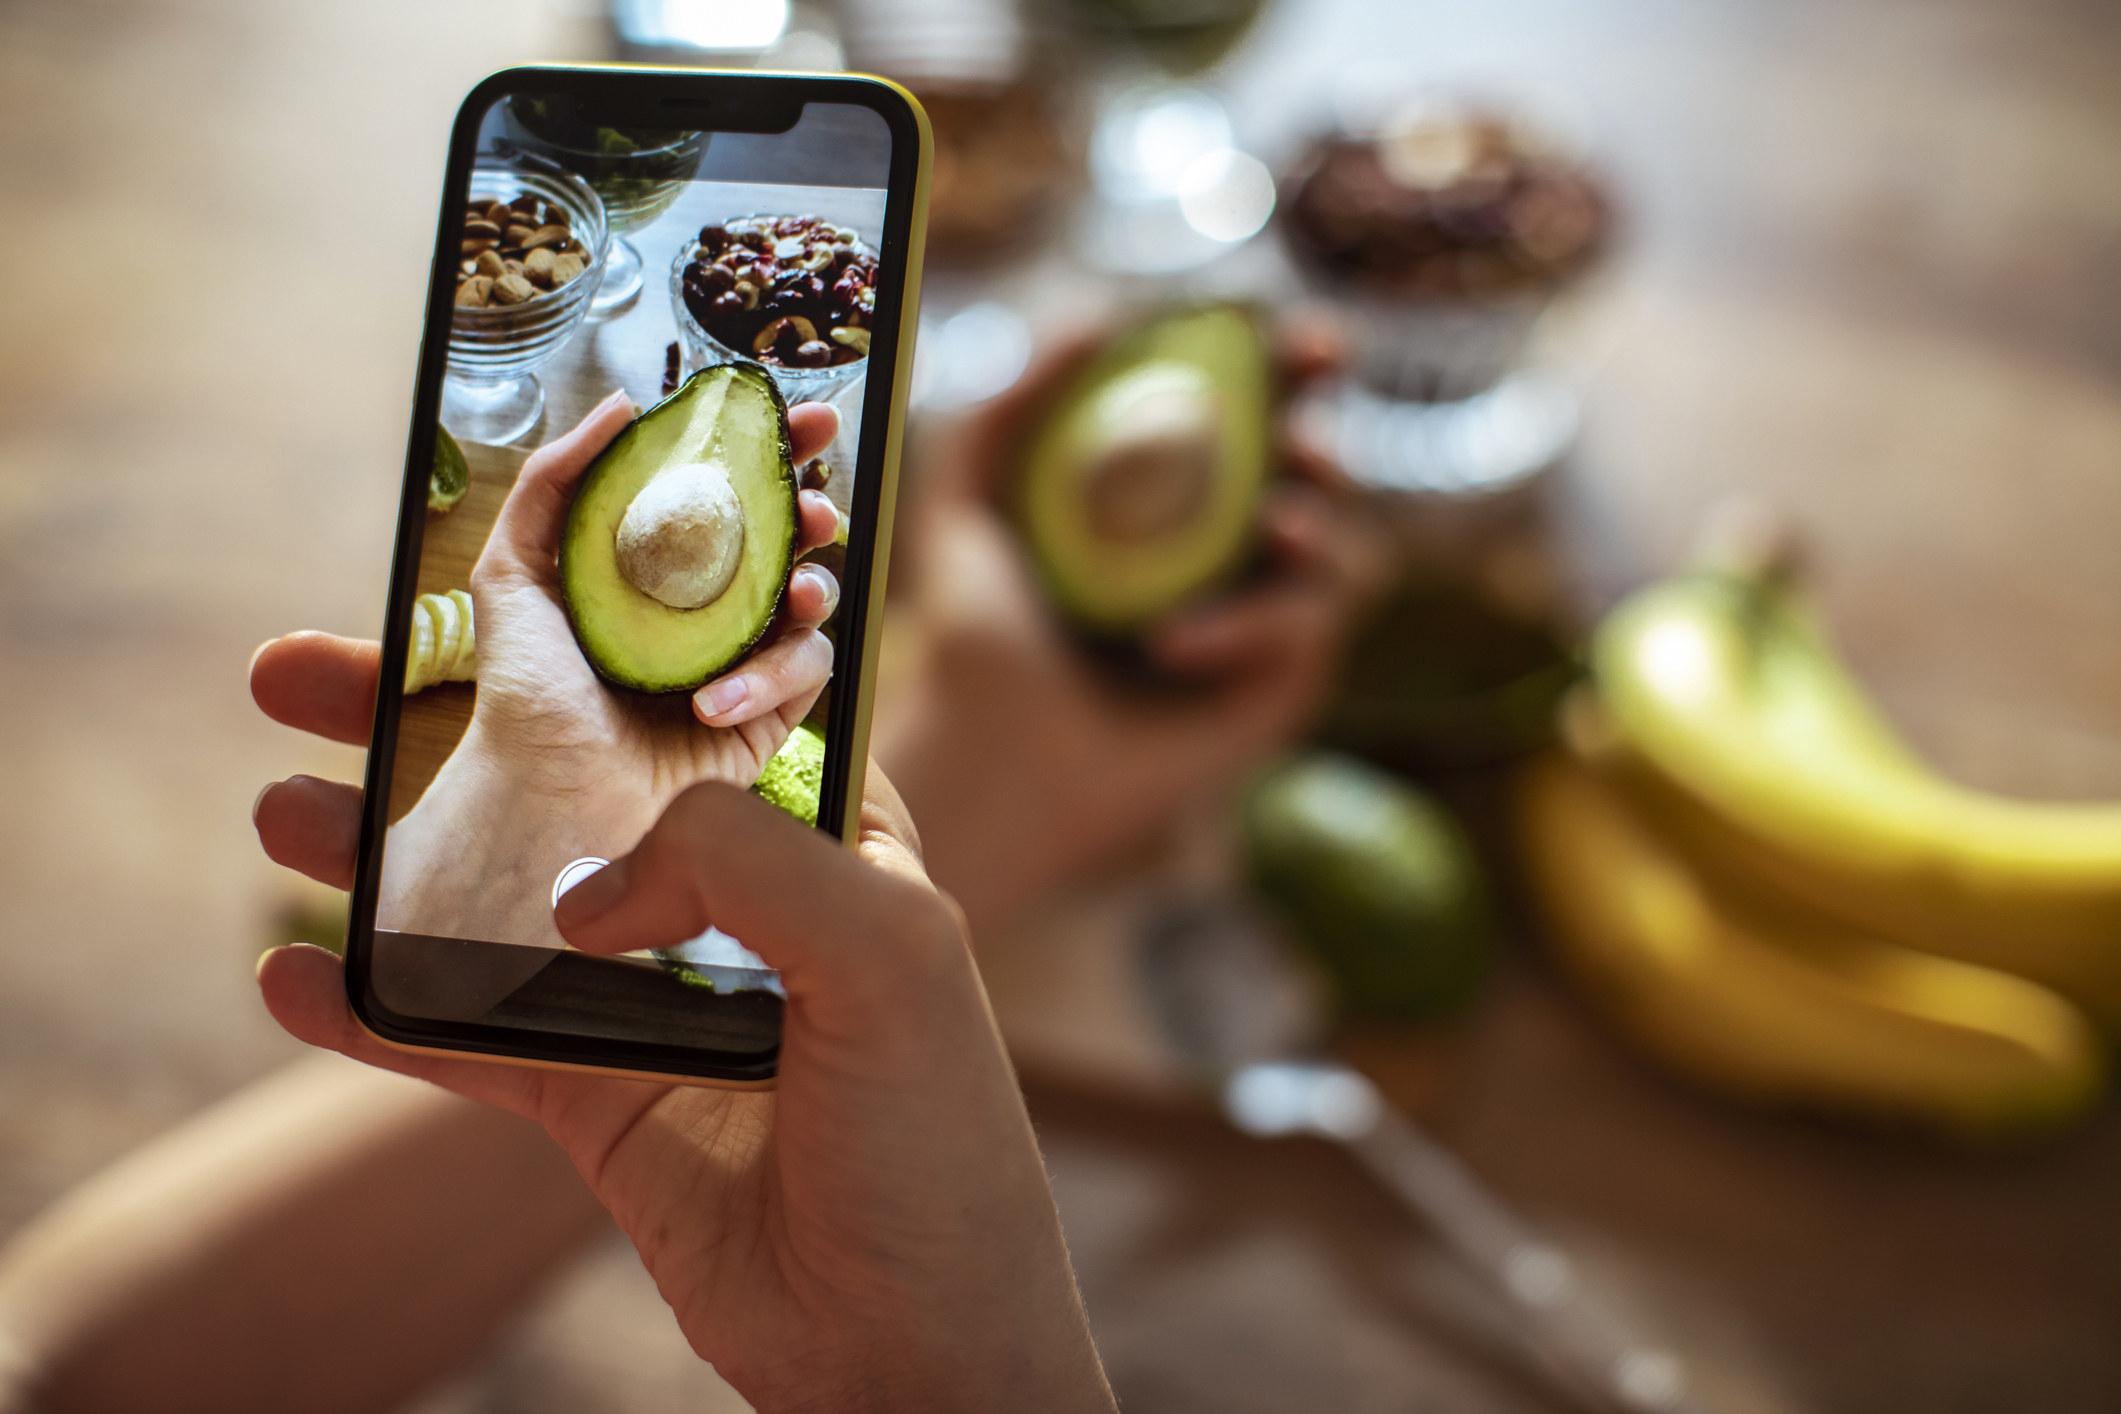 A person taking a photo of an avocado.